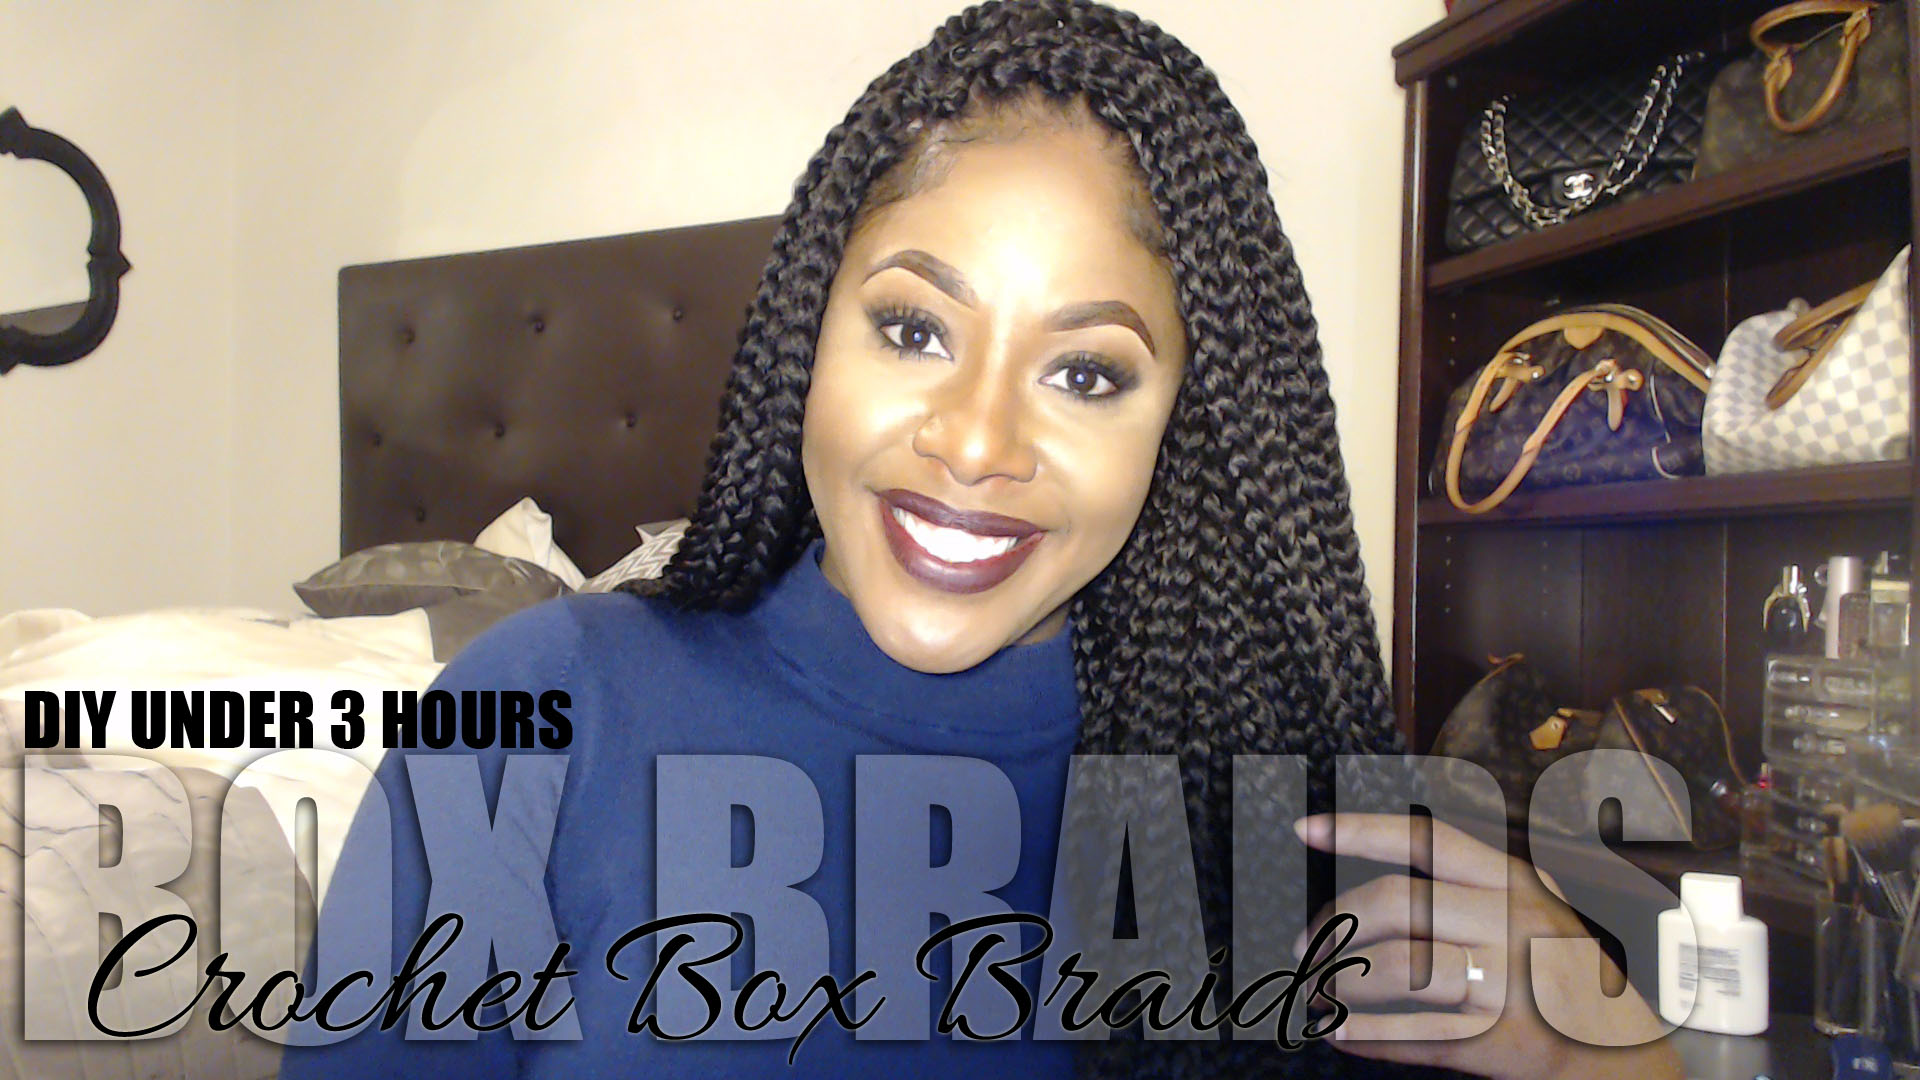 Box Braids Using Crochet Method : Quick & Easy Box Braids using Crochet Method - Makeup by Mesha